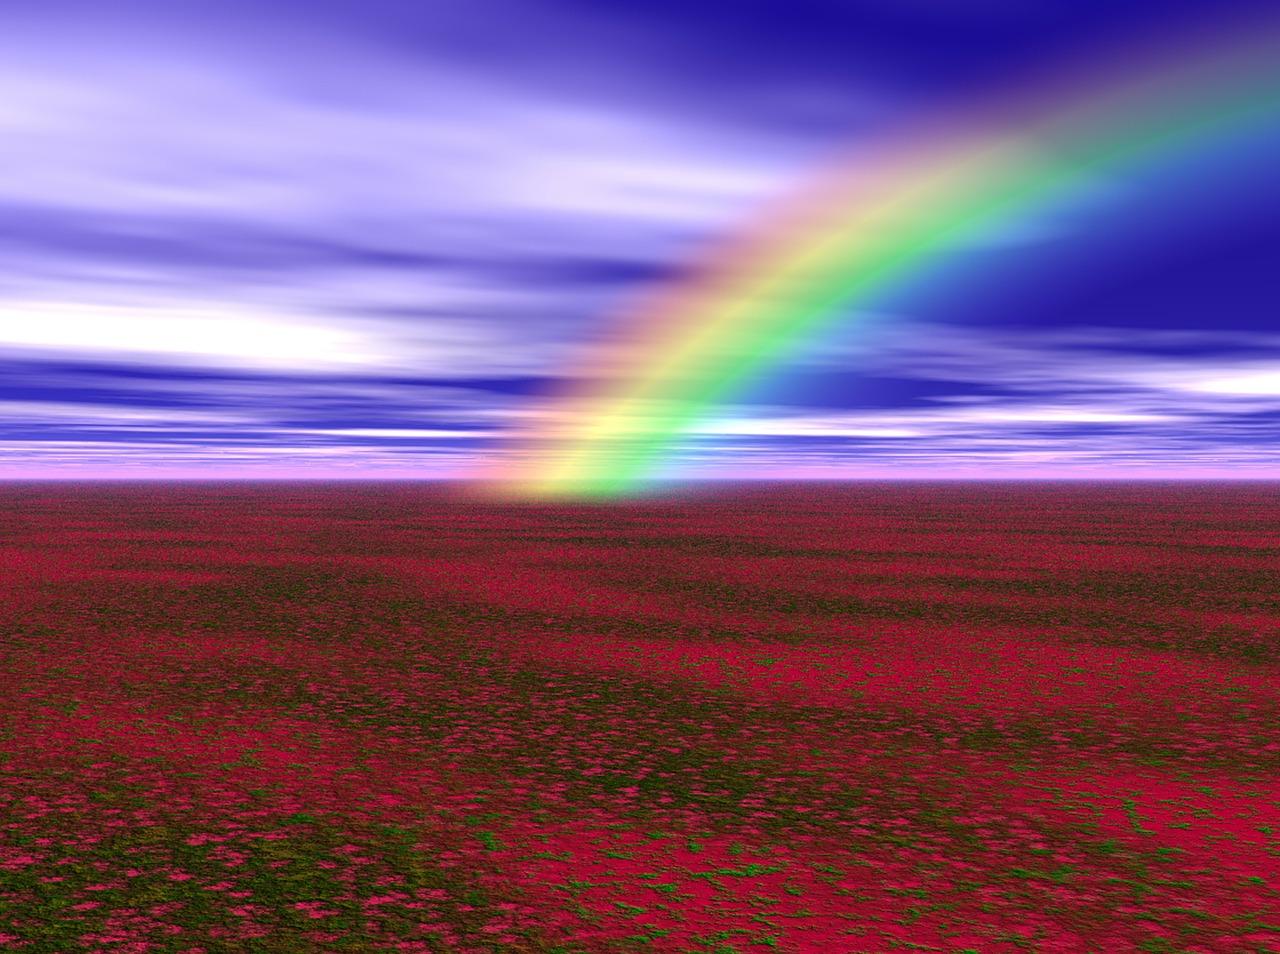 rainbow bridge poppy field Critter Caretakers Pet Services Pet Grief and Loss